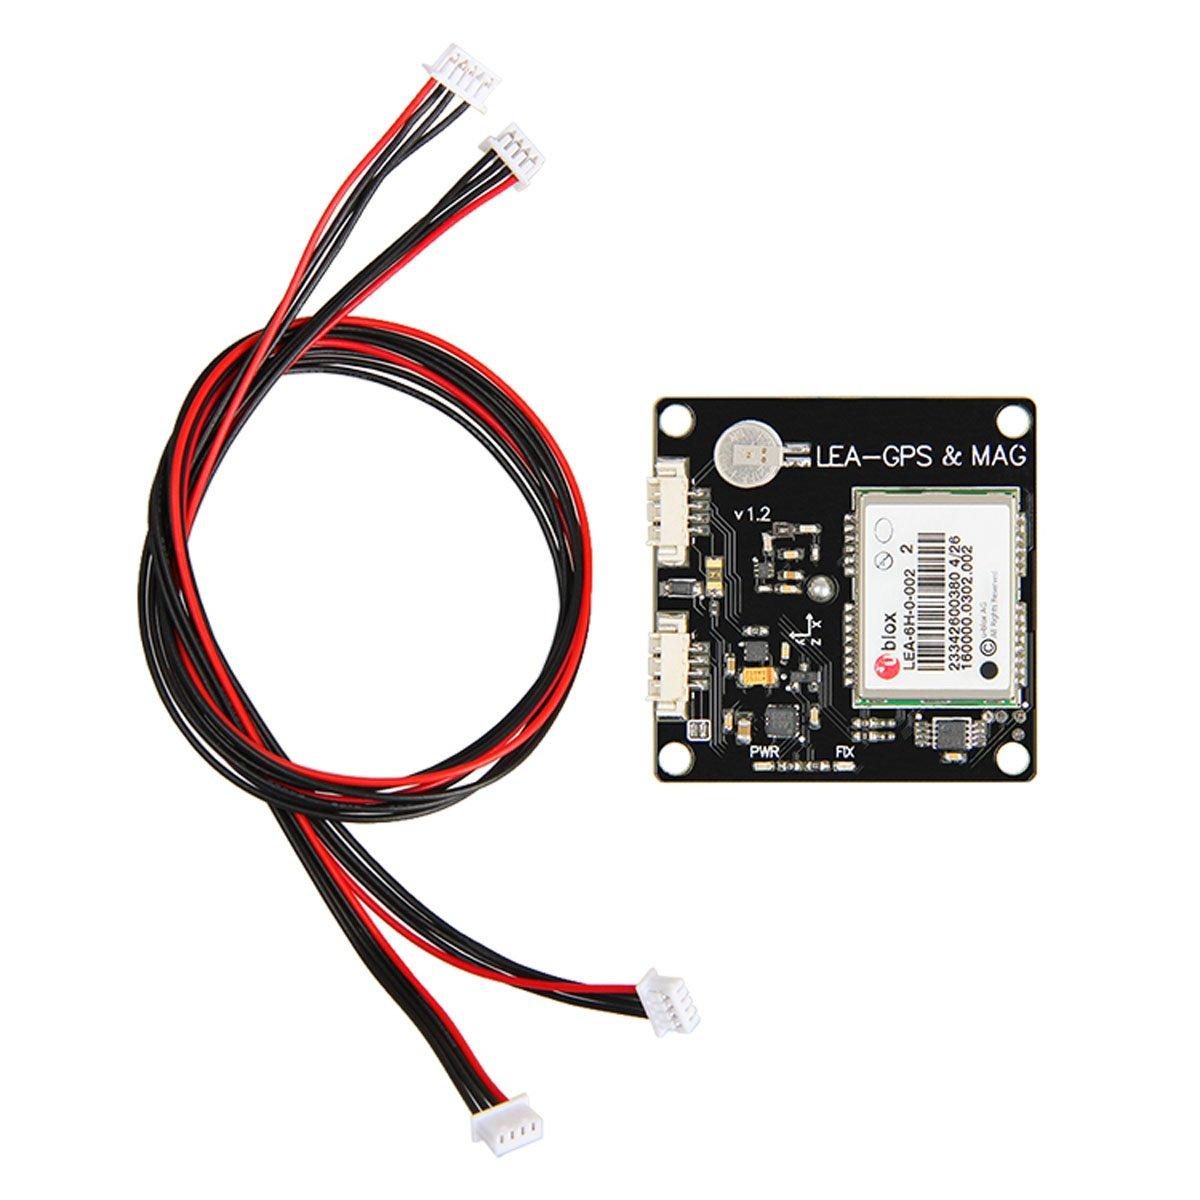 OLSUS Practical LEA-GPS & MAG GPS Module for APM 2.52